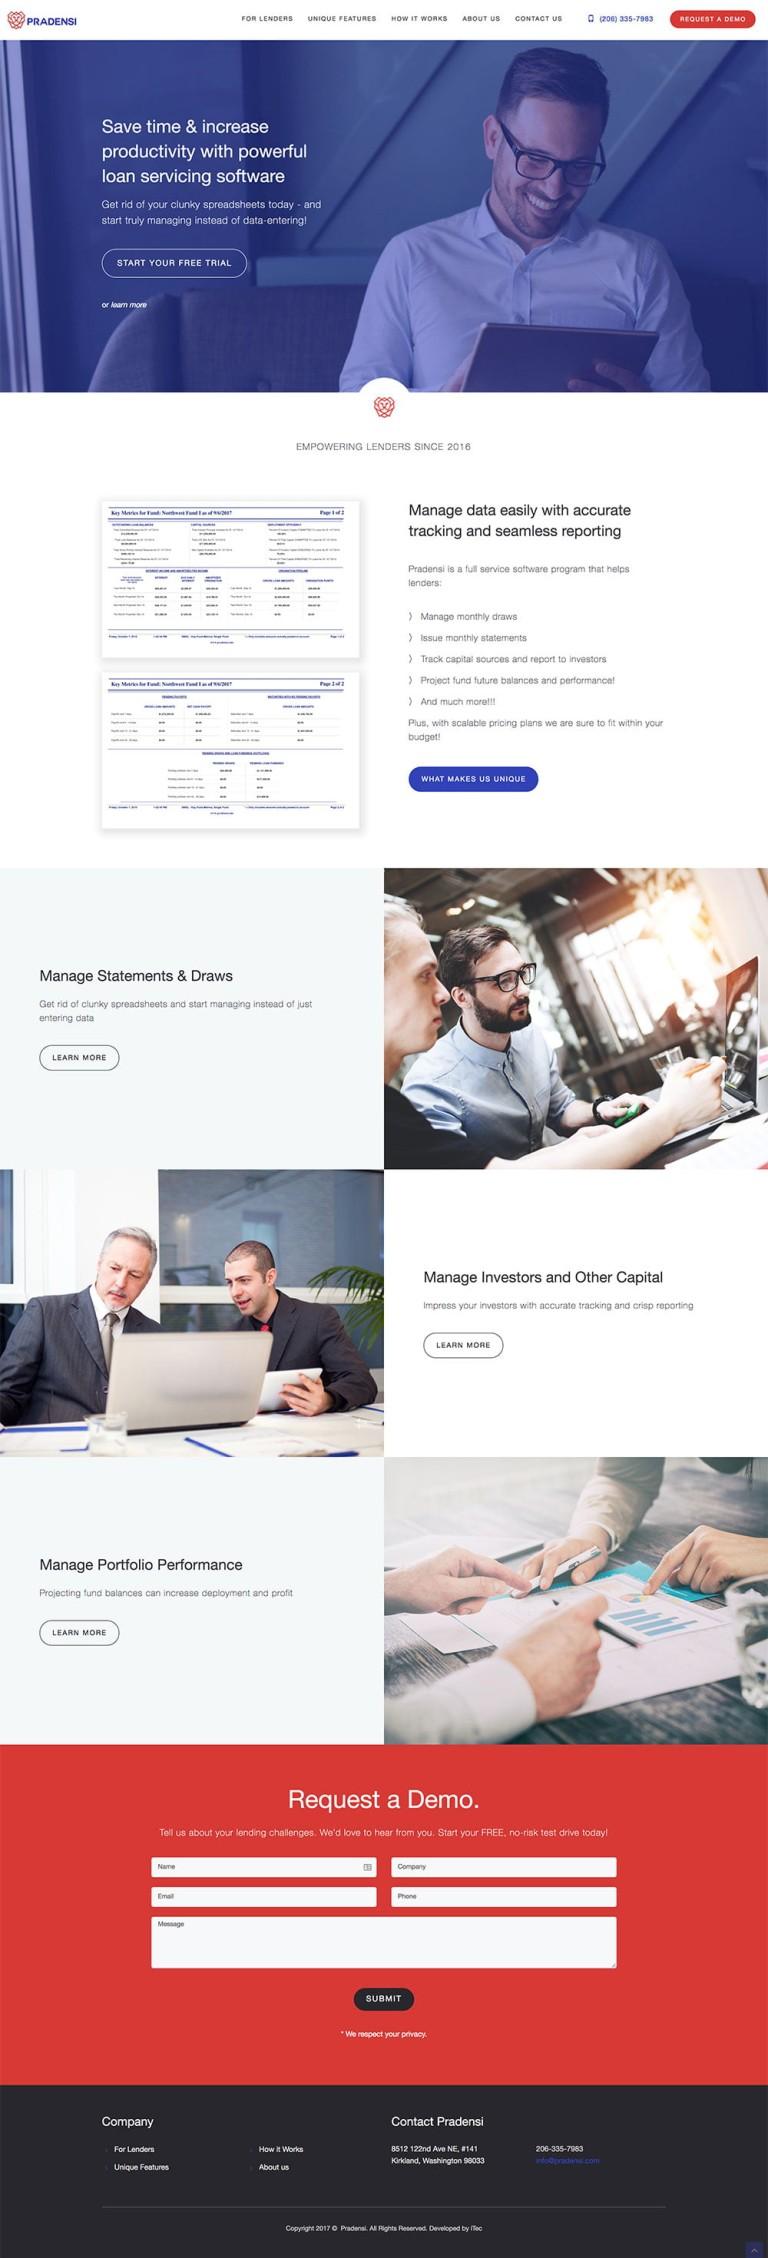 web-design-portfolio-pradensi1